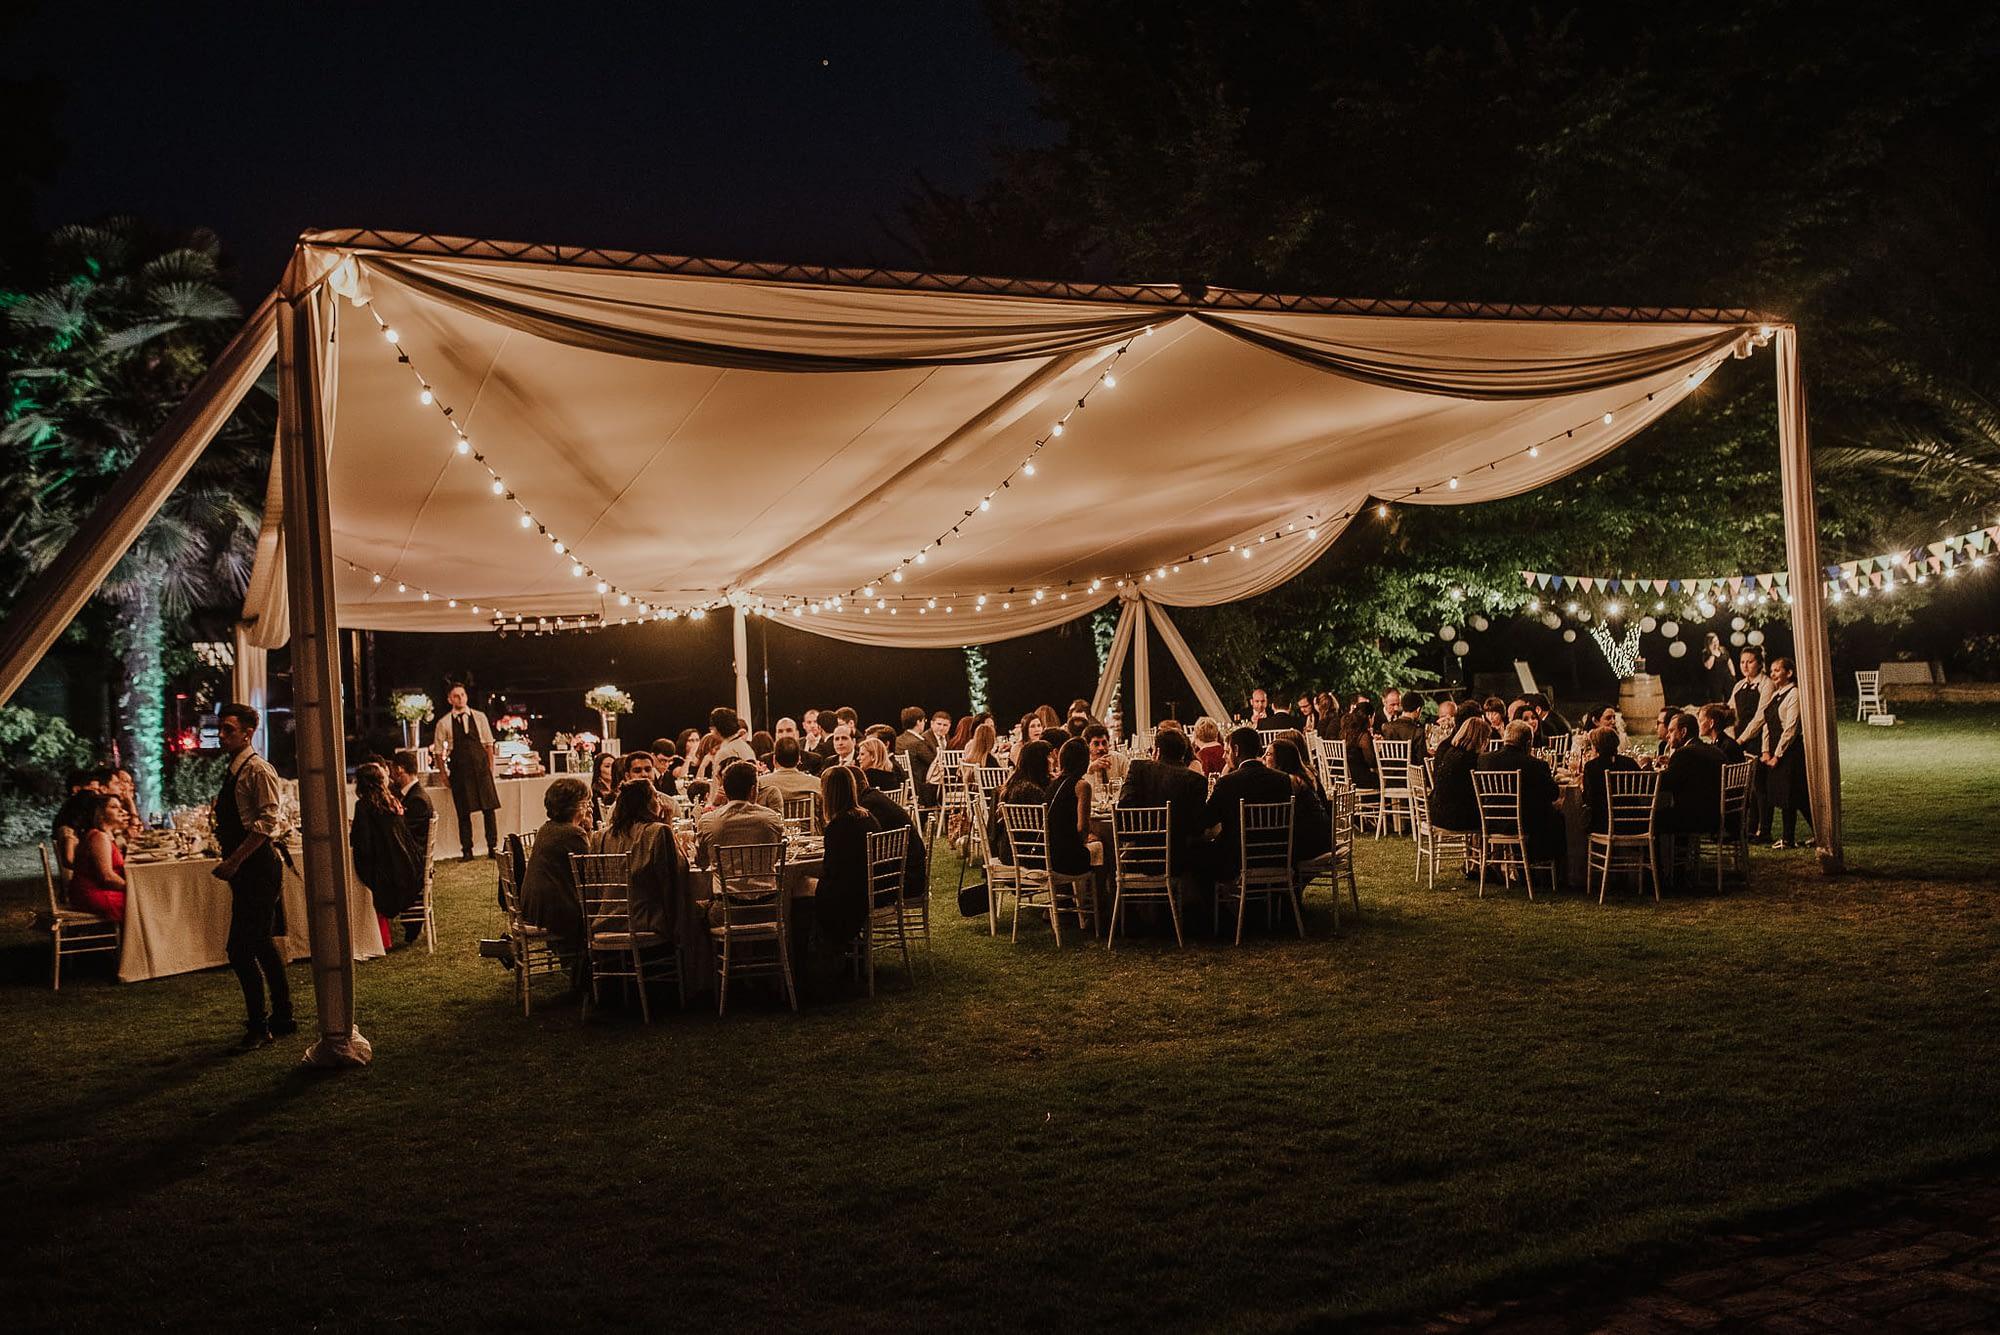 casa de campo fuller-cena campestre